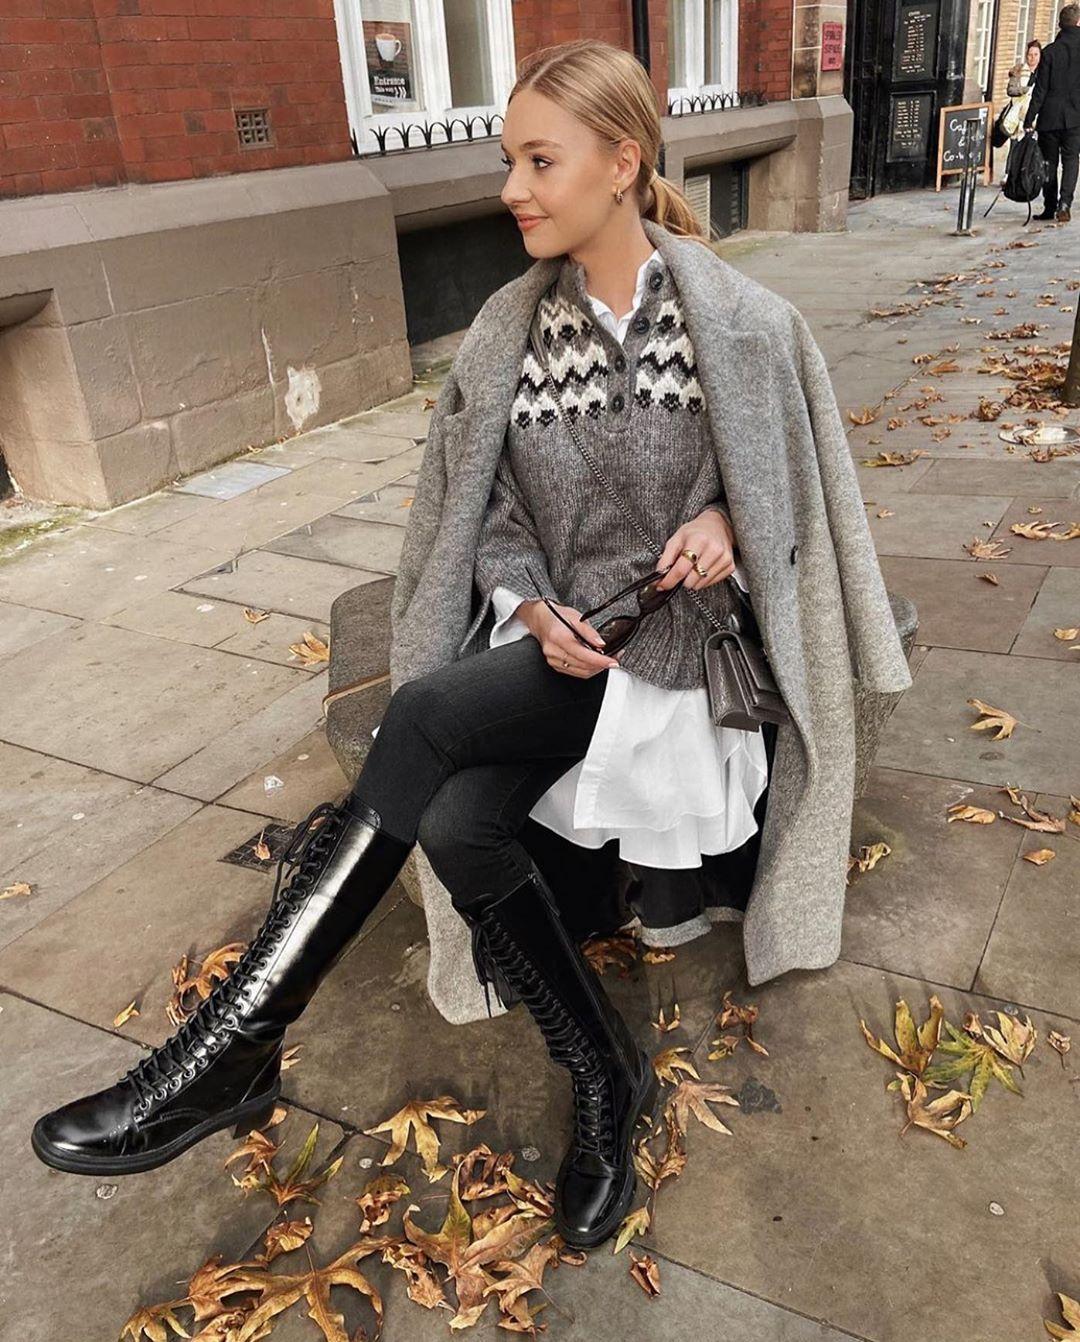 lace-up flat boots de Zara sur zarastreetstyle